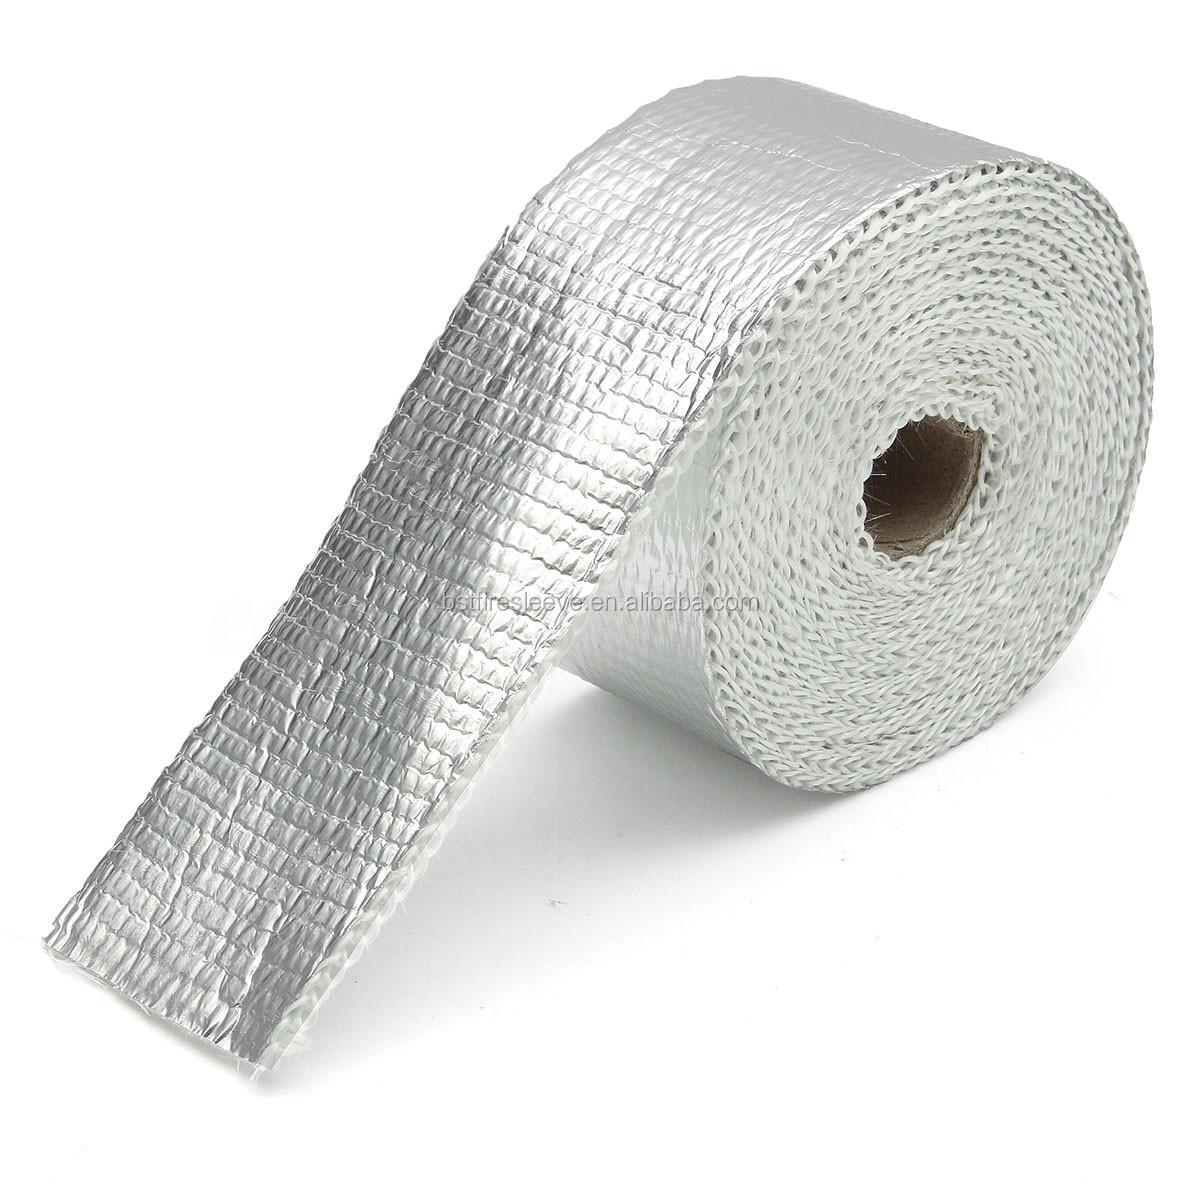 aluminum foil fiberglass heat shield exhaust heat wrap buy exhaust heat wrap heat shield wrap aluminum foil fiberglass wrap product on alibaba com